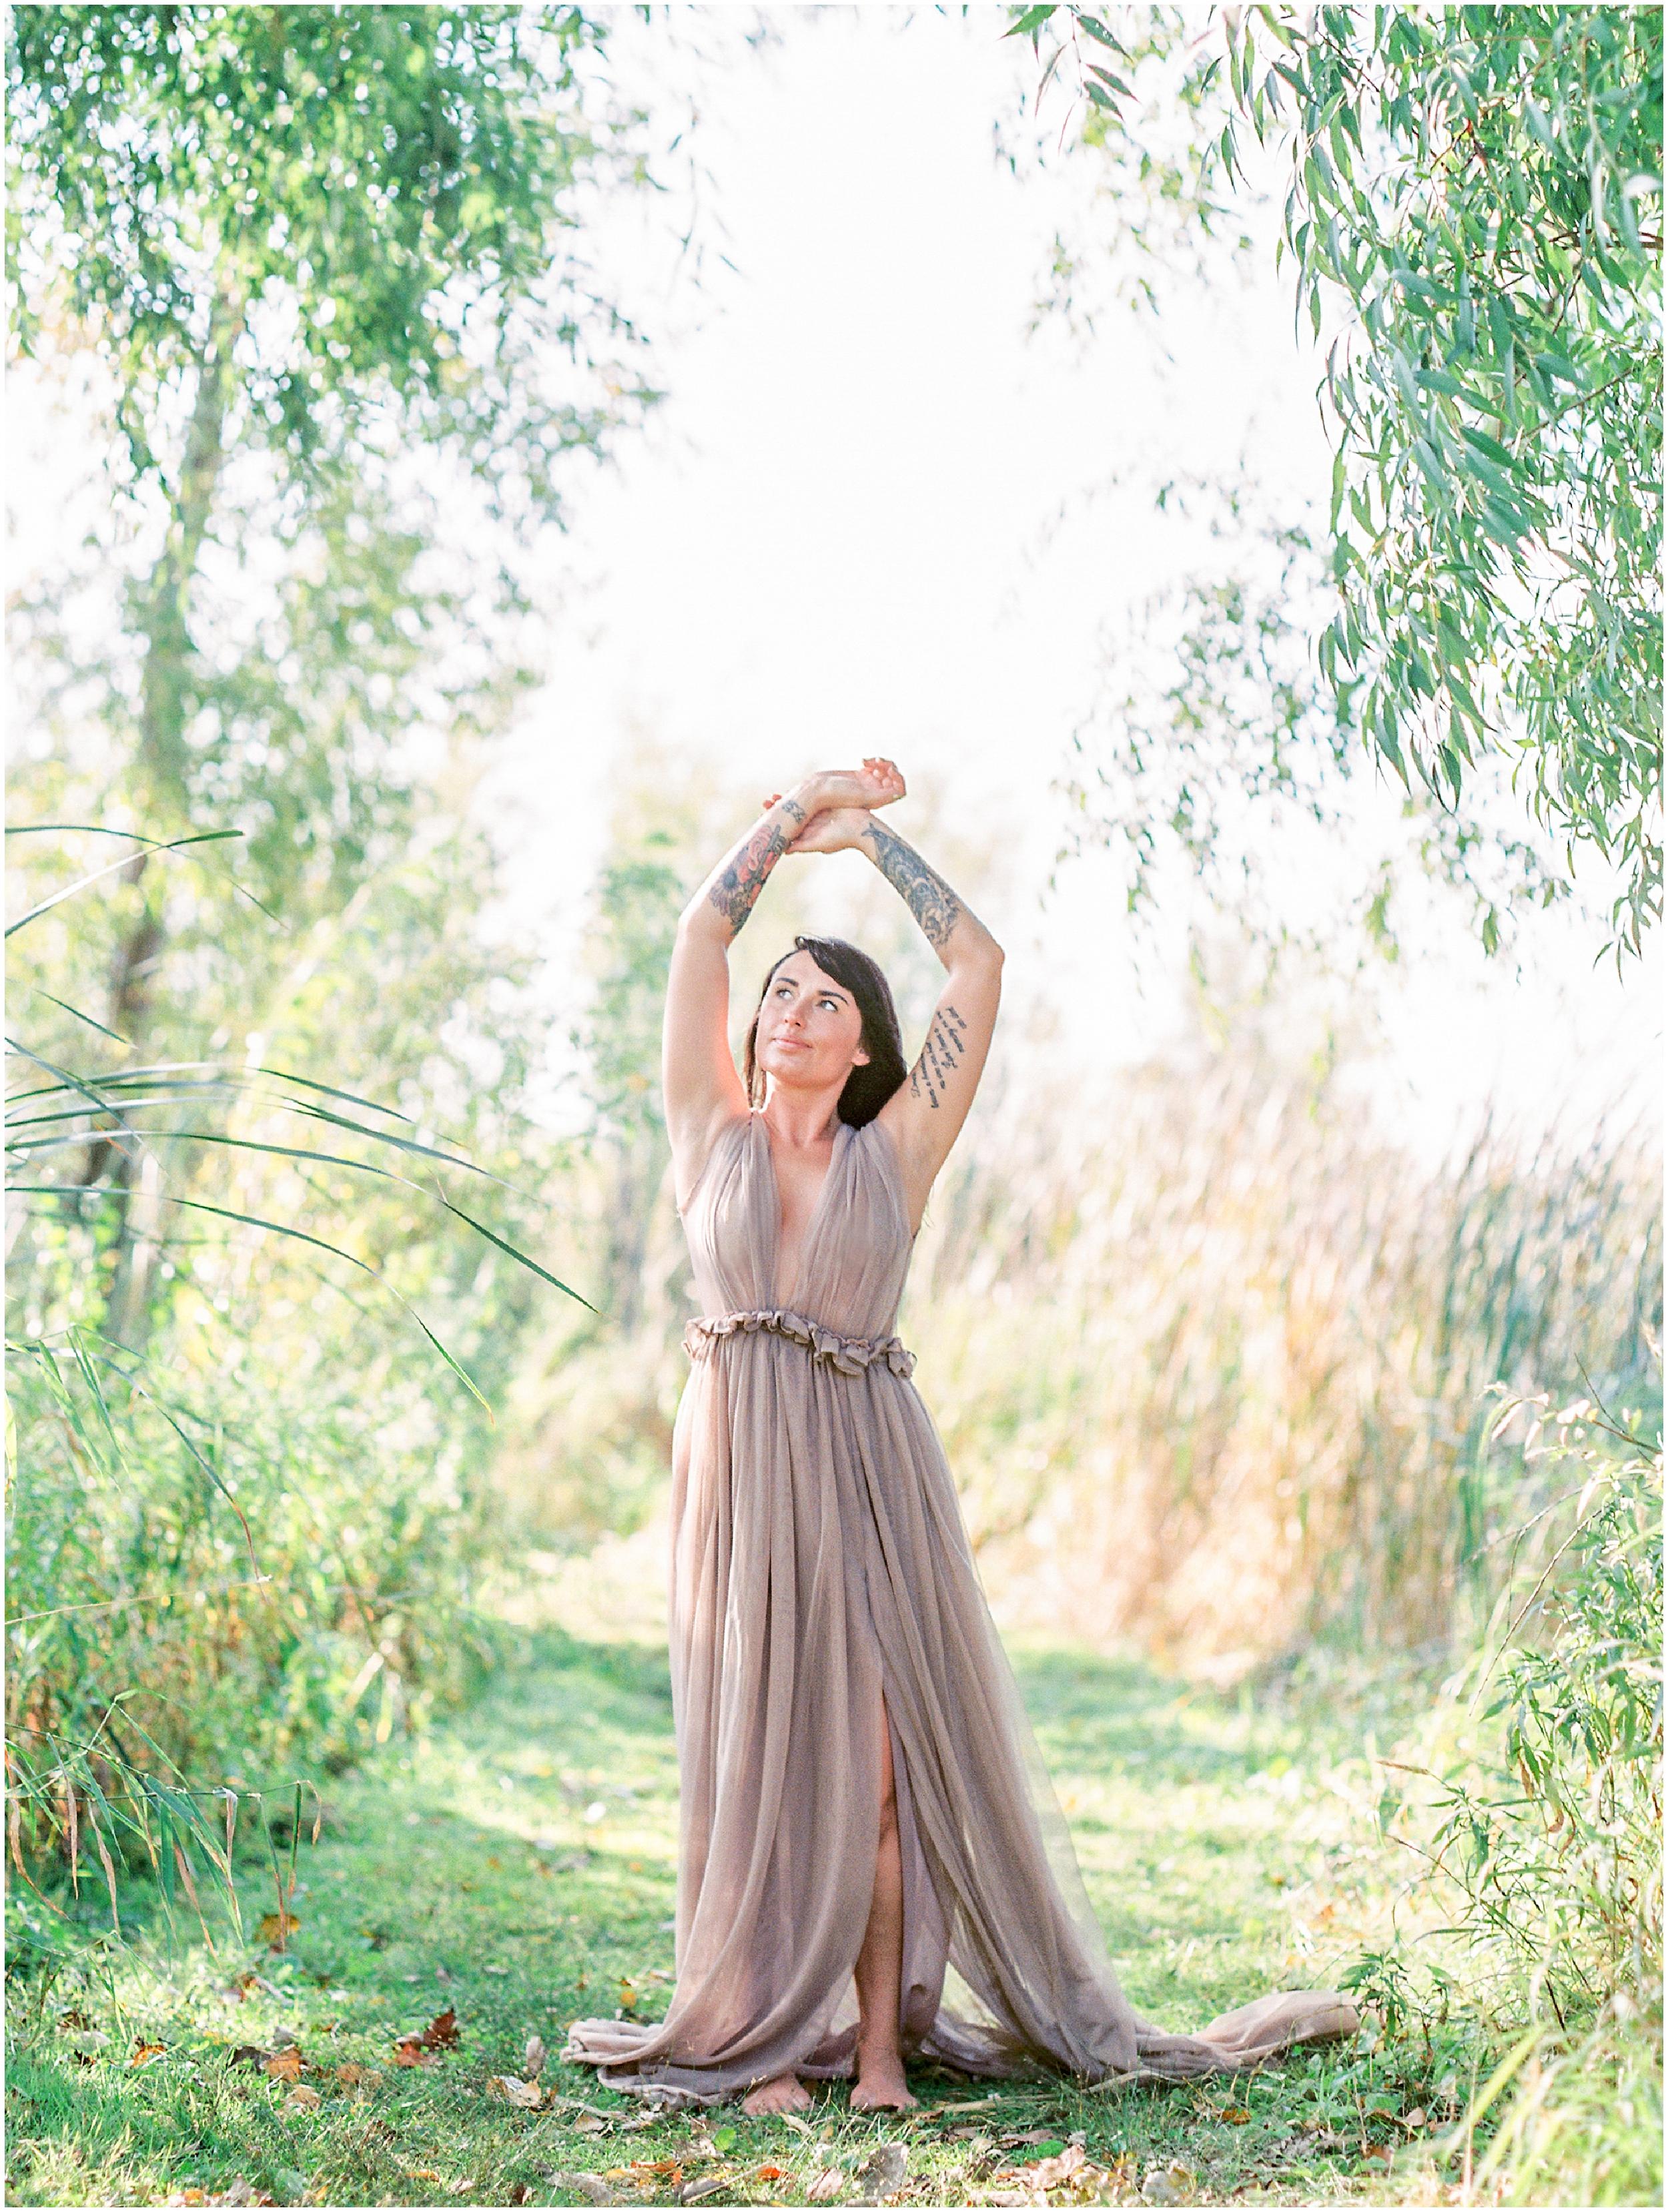 Natural Outdoor Boudoir Session at the Prairie- Lisa Silva Photography- Jacksonville, Florida Fine Art Film Wedding Photography_0035.jpg